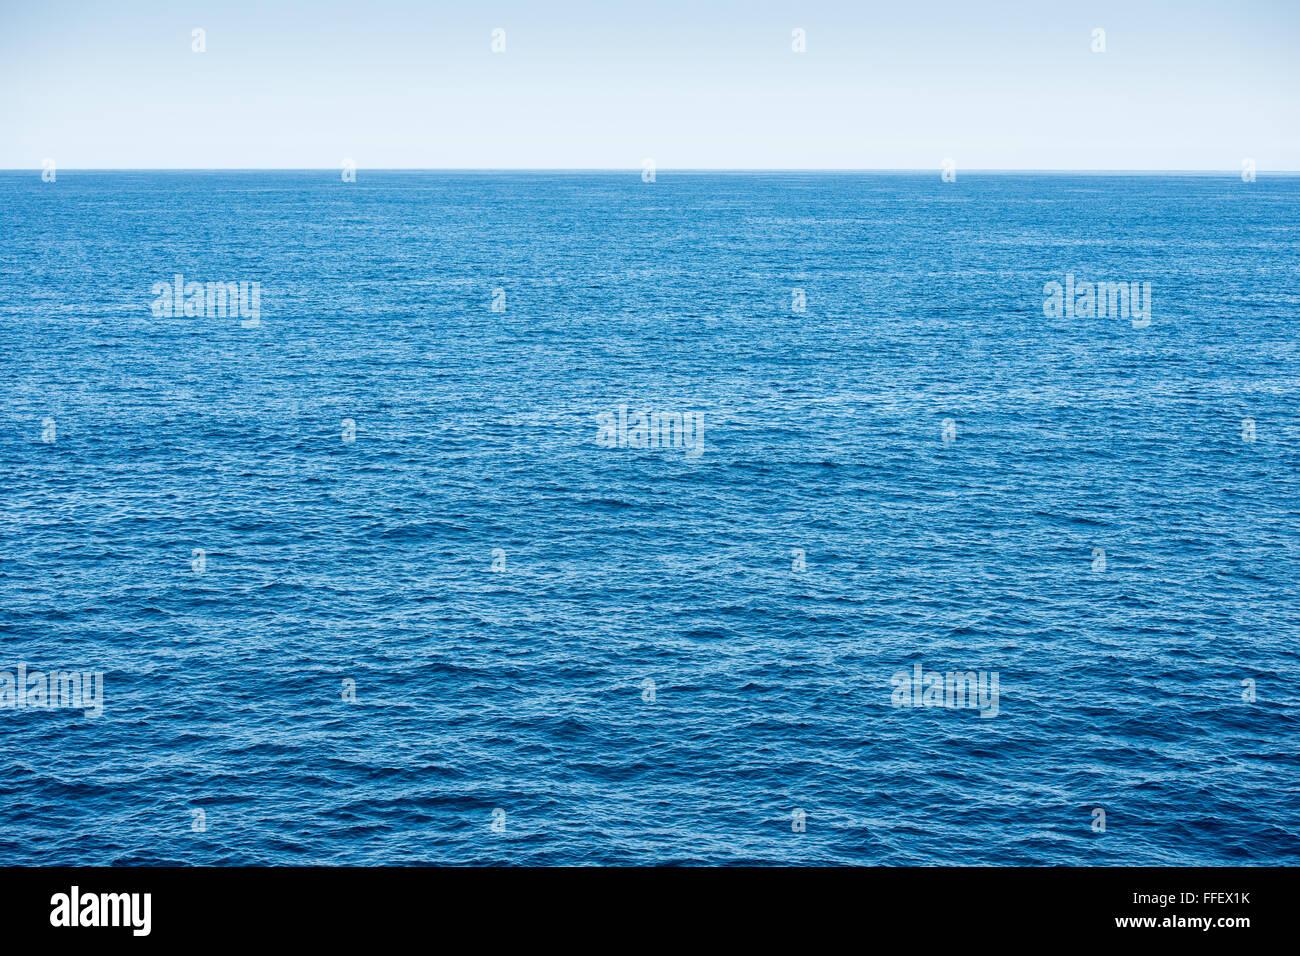 L'océan bleu avec fond bleu ciel et l'eau d'un bleu profond Photo Stock